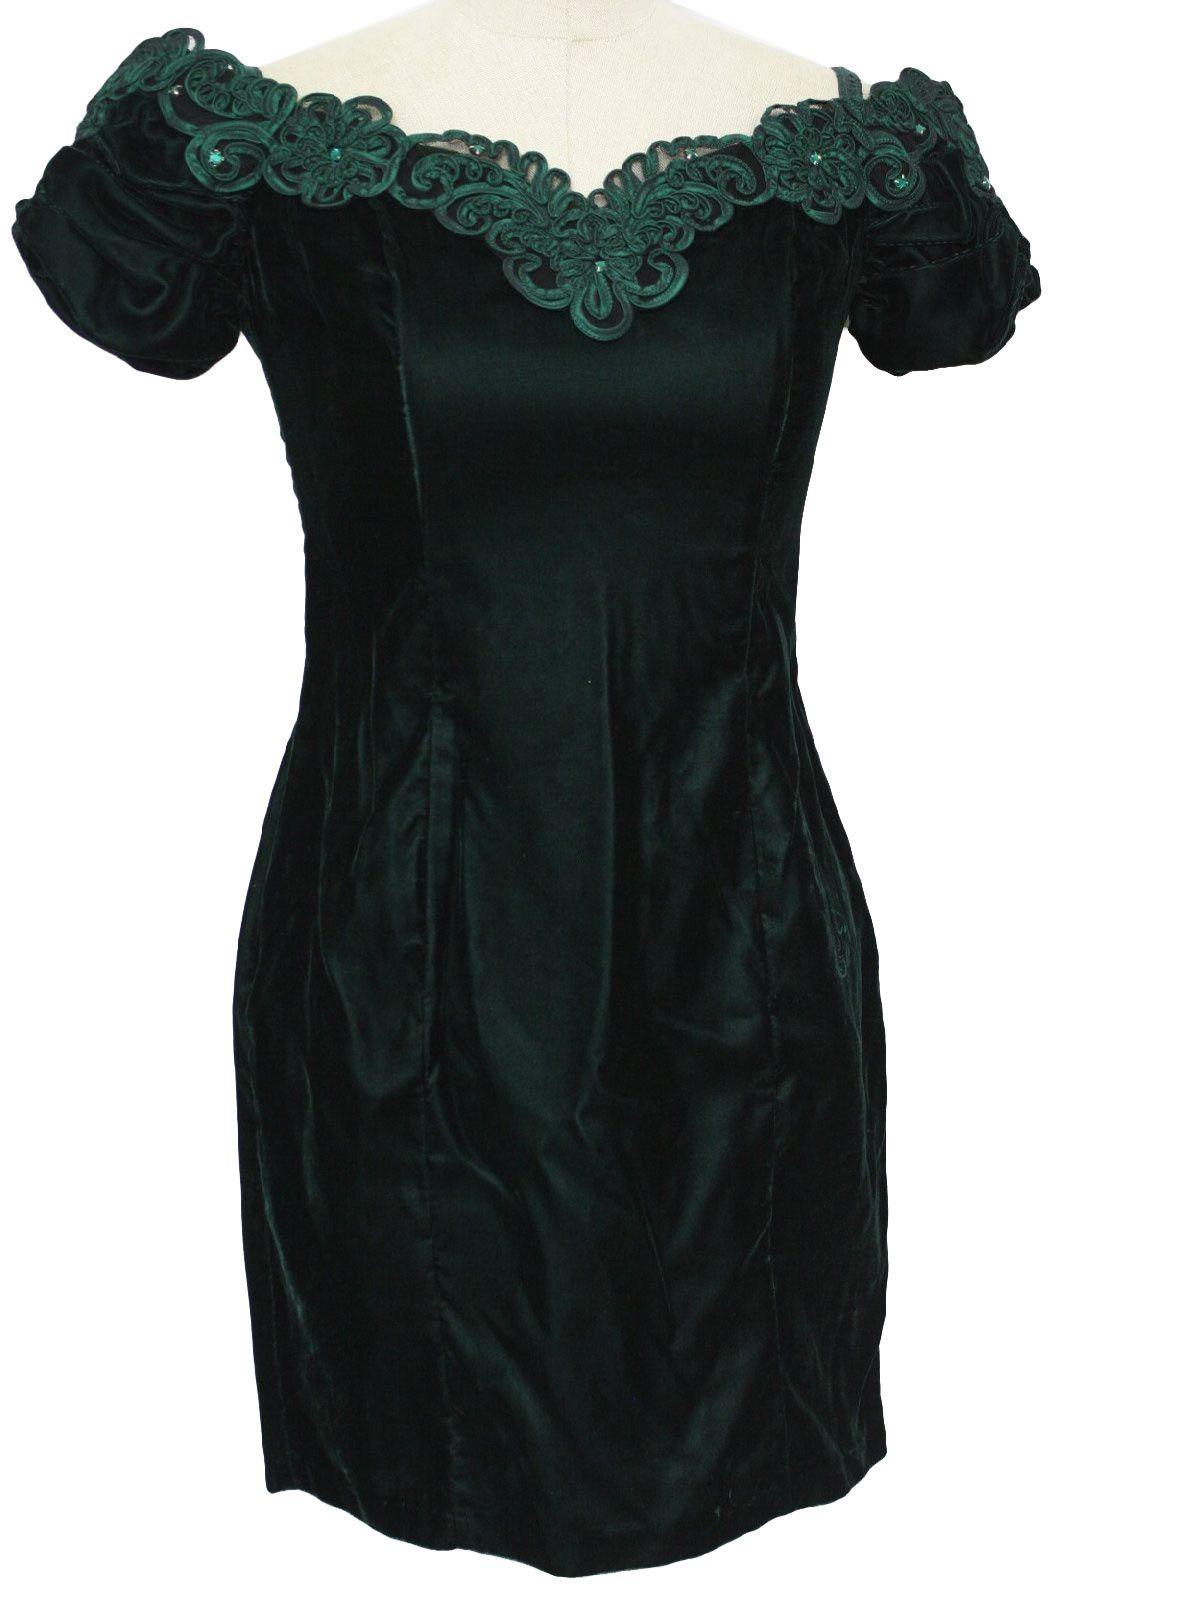 Emerald green rayon velvet prom dress motherus dresses pinterest